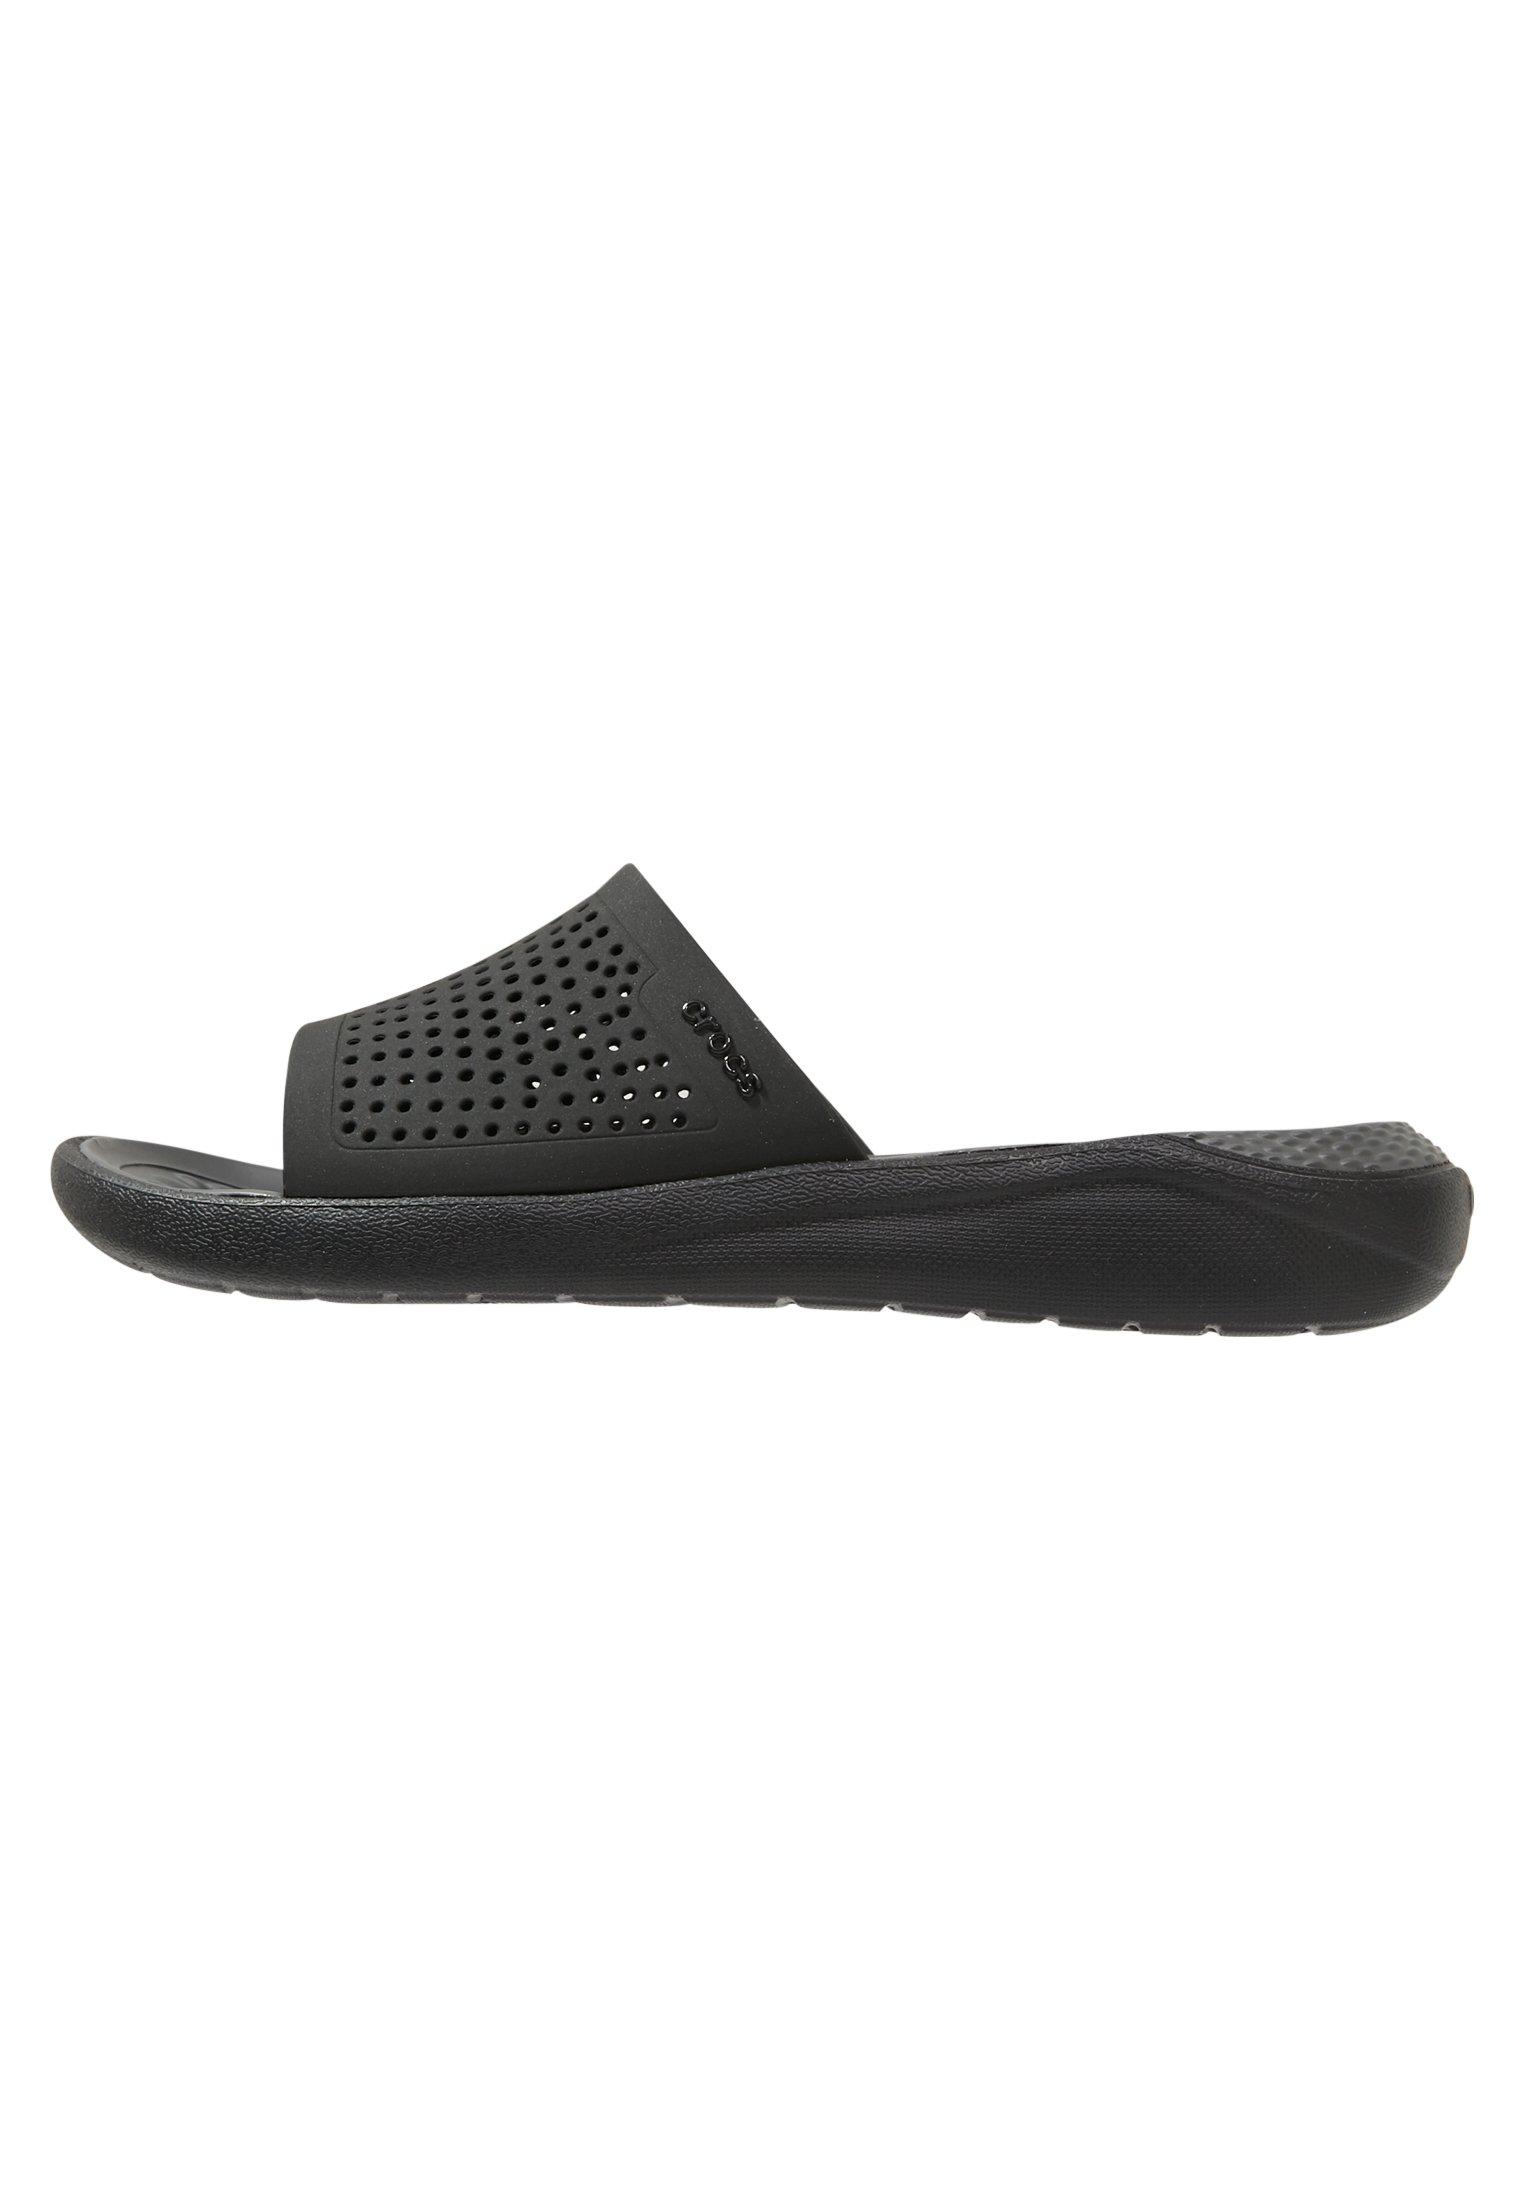 Crocs LITERIDE SLIDE - Sandały kąpielowe - black/slate